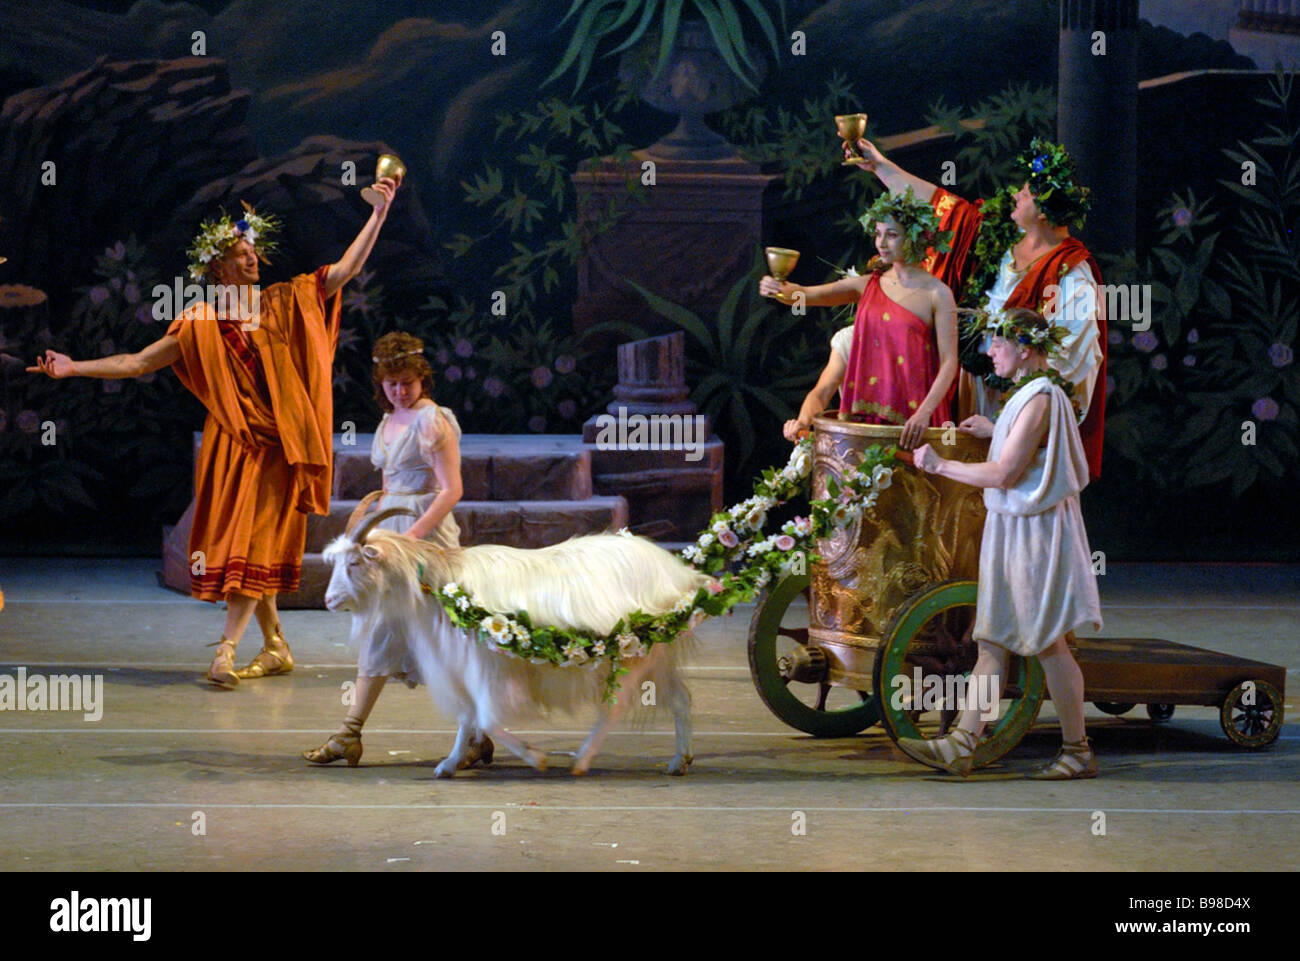 Scene from ballet The Awakening of Flora by Ricardo Drigo at Mariinsky Theater The ballet restored by Marius Petipa - Stock Image